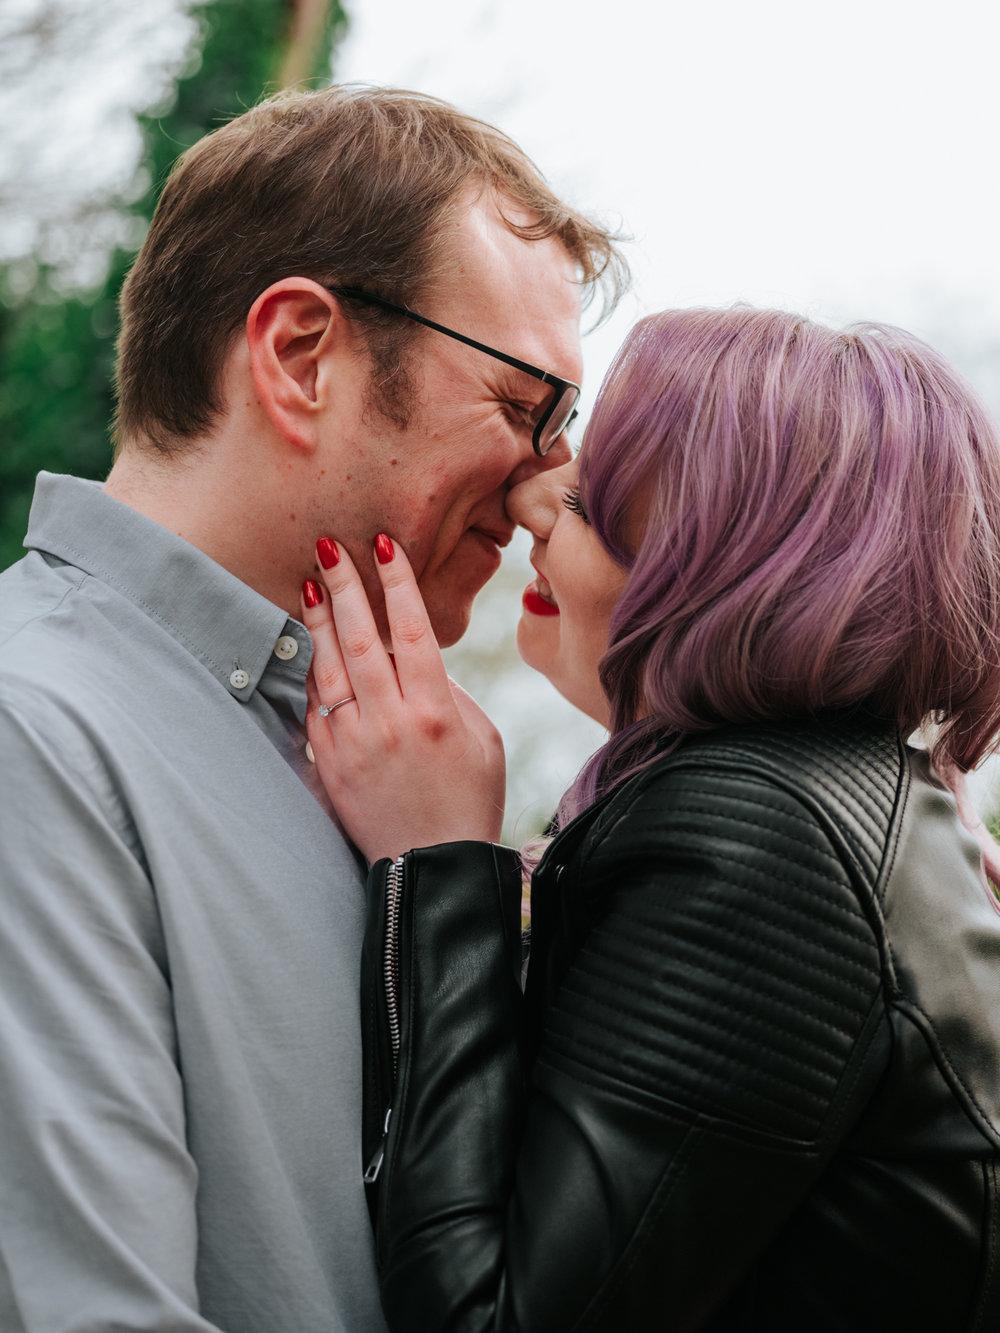 Stolen Glimpses eattle Wedding Photographer 1-21.jpg